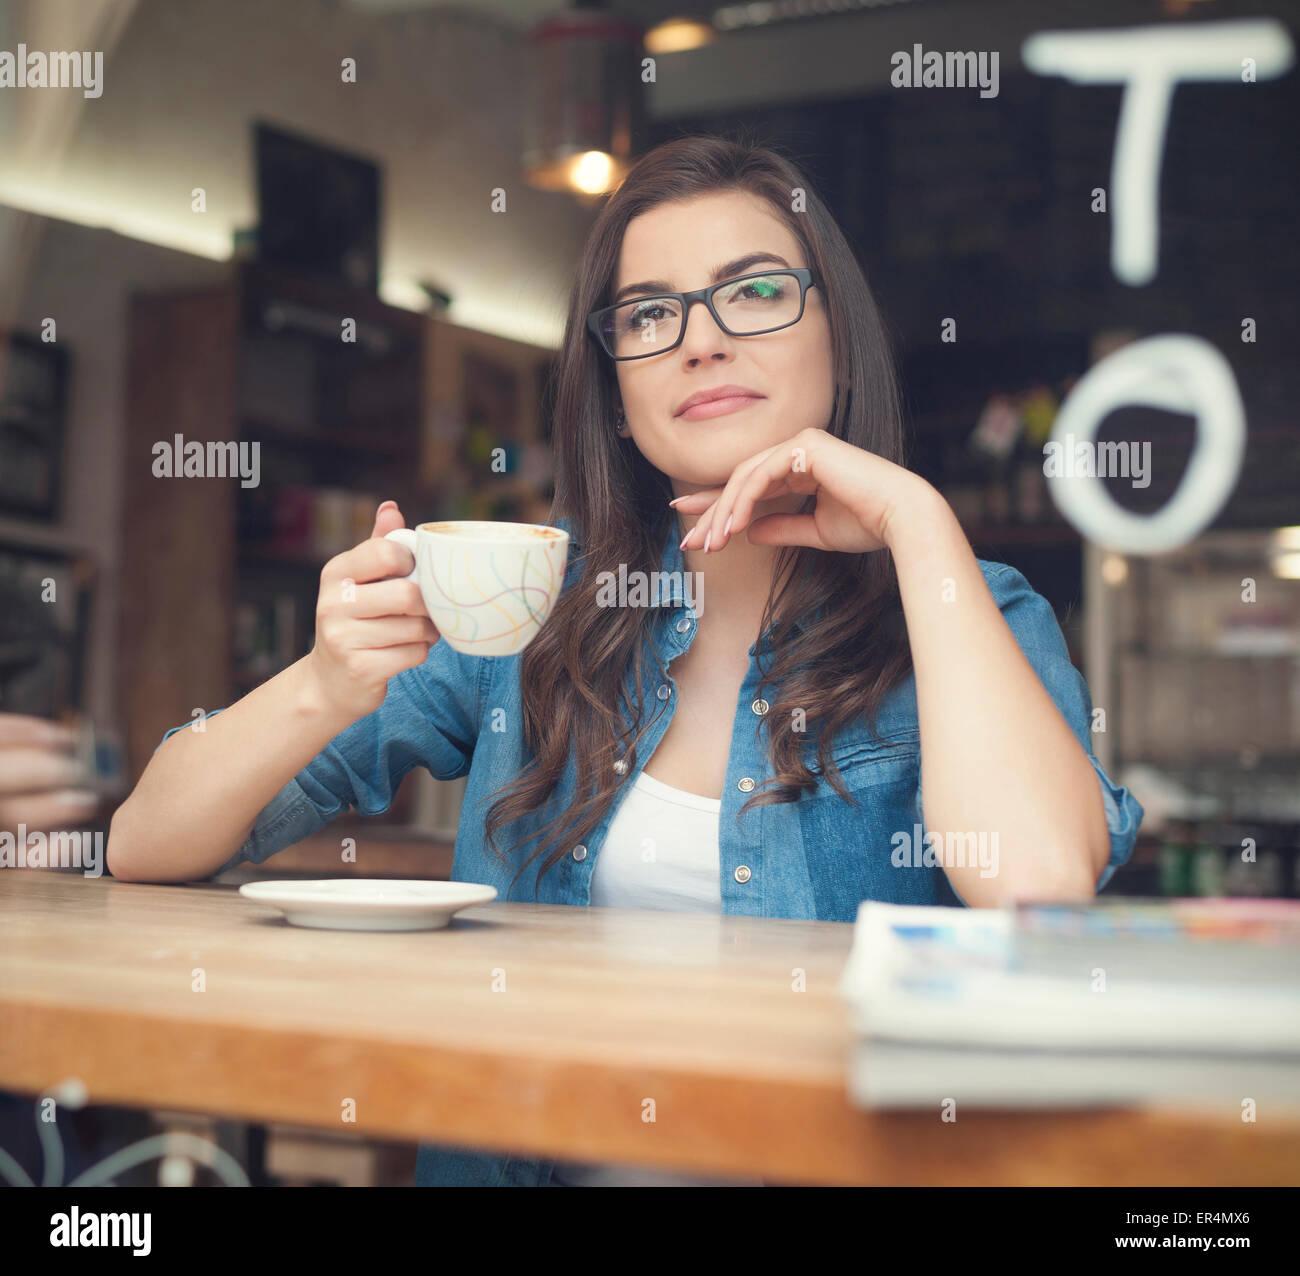 Portrait der schönen Frau trinken Kaffee im Café. Krakau, Polen Stockbild